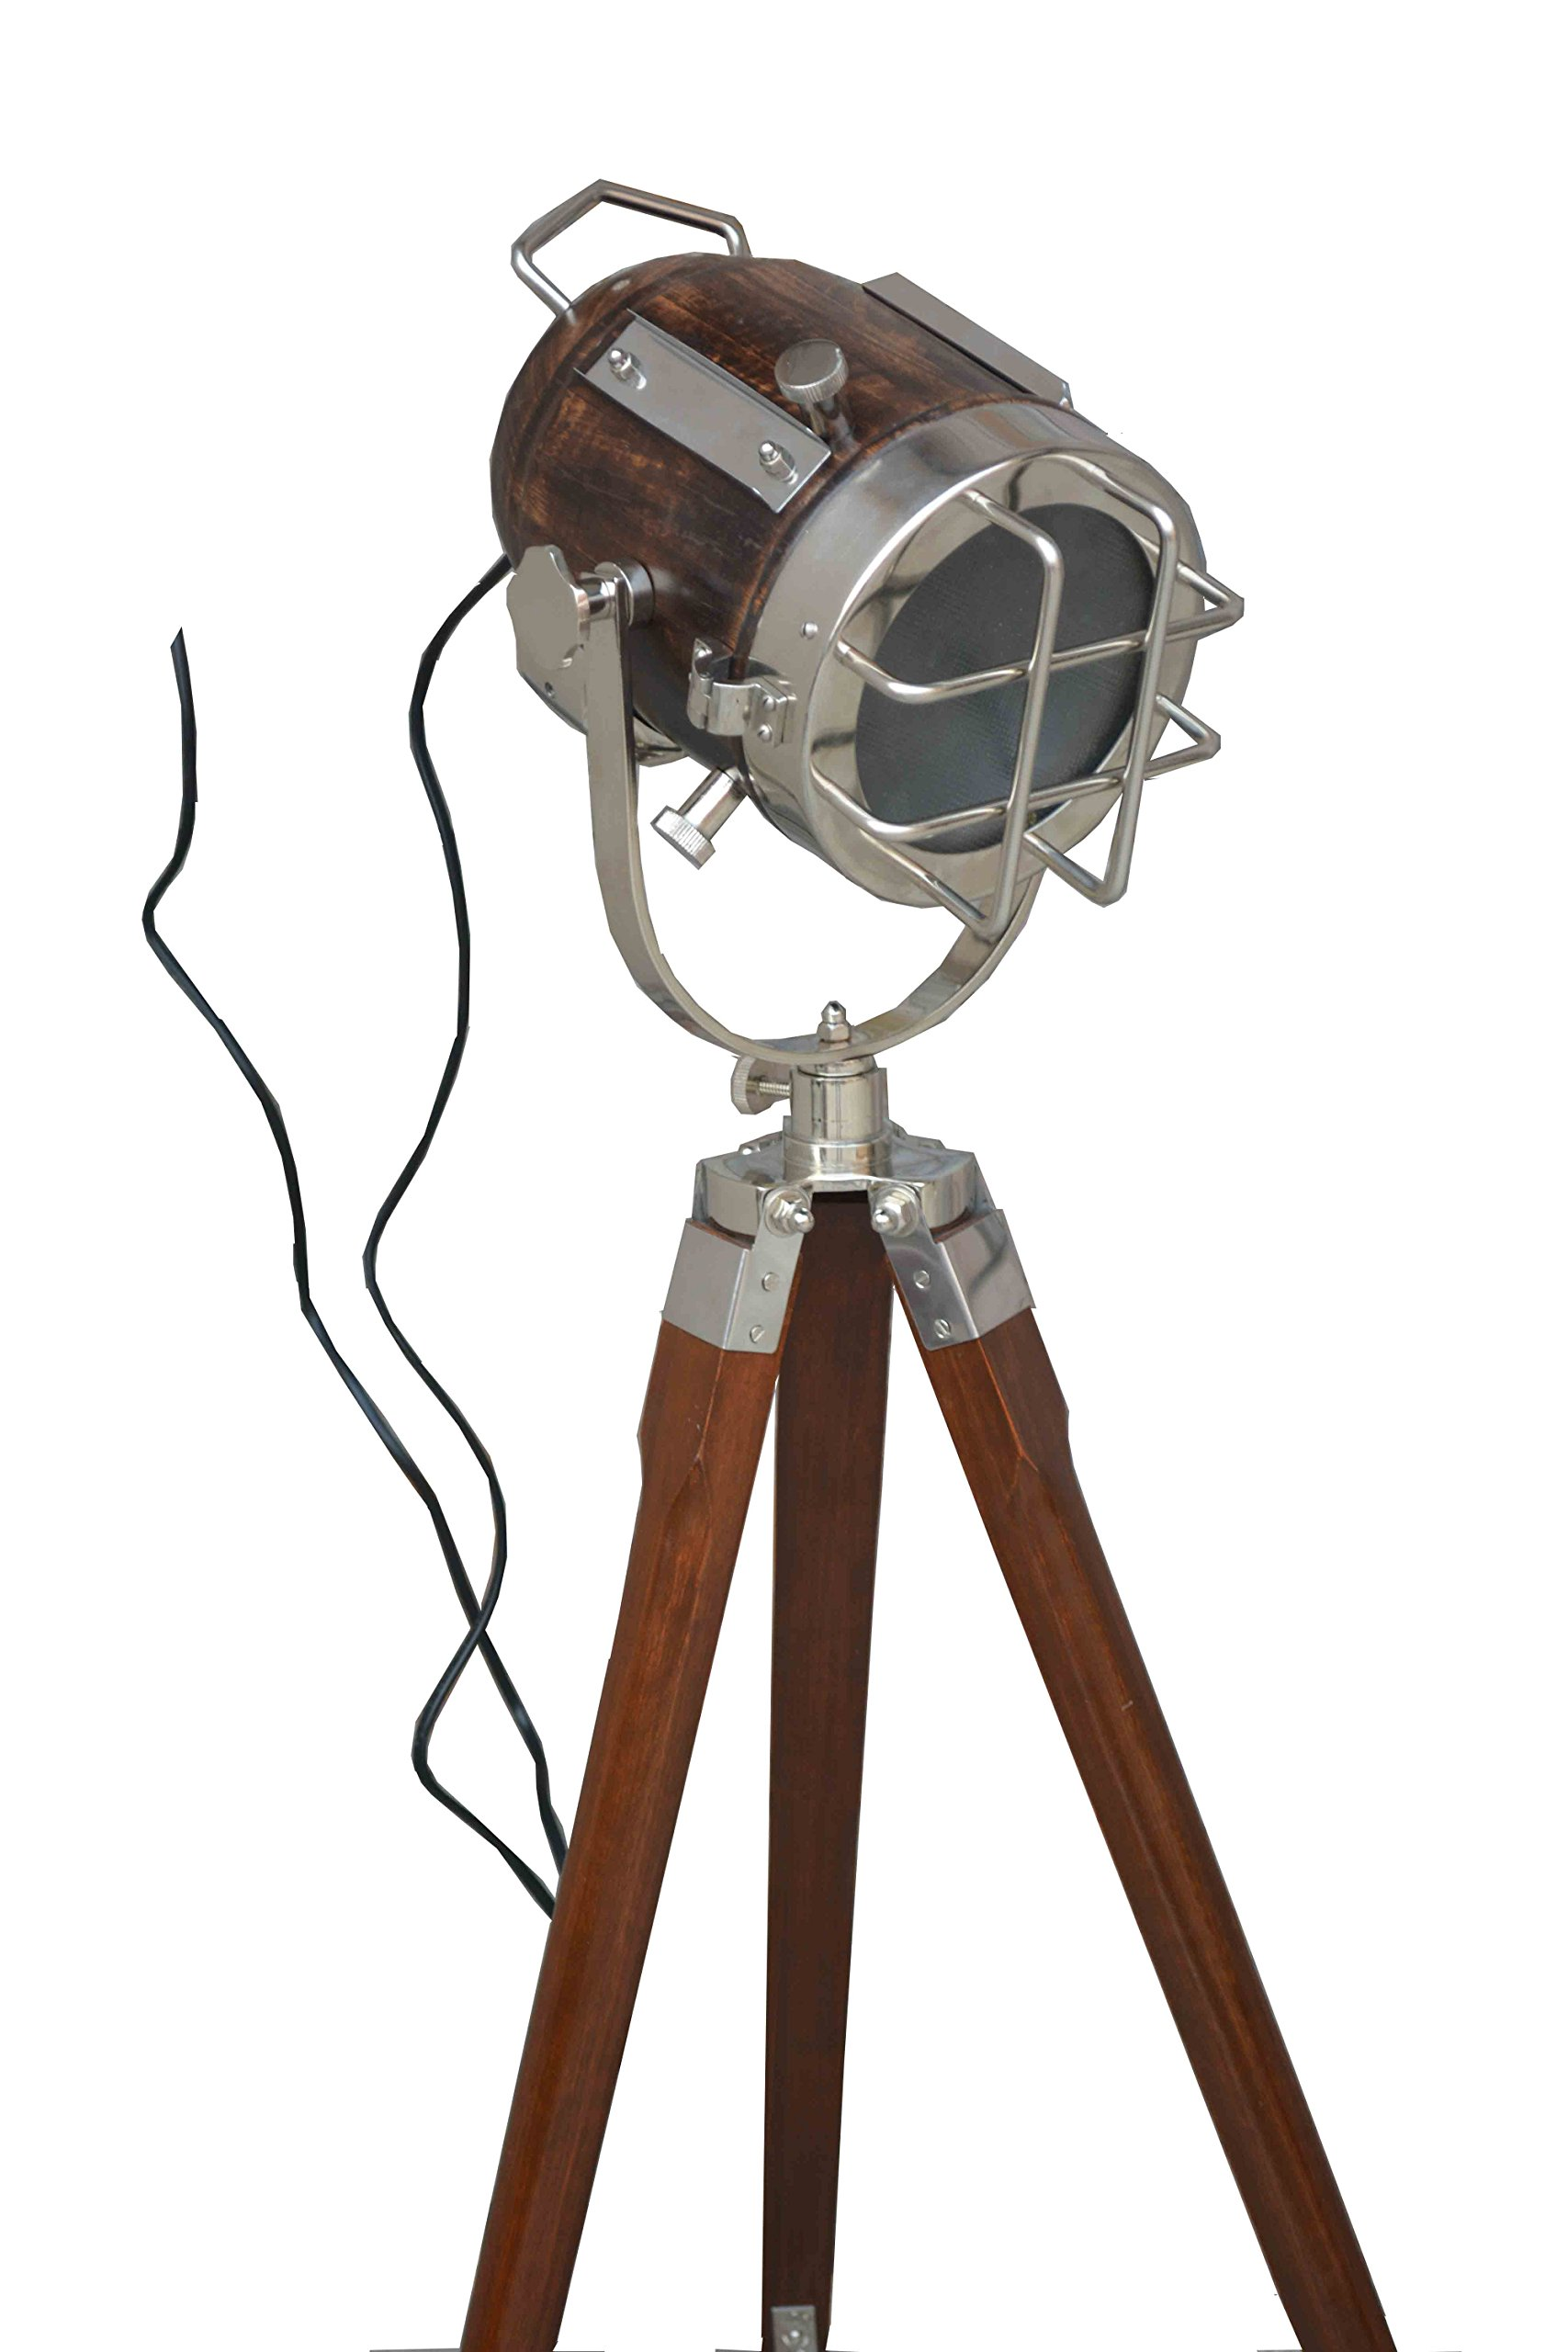 DESIGNER STUDIO FLOOR LAMP TRIPOD SEARCHLIGHT HOME DECOR LIGHT by Nautical India (Image #3)